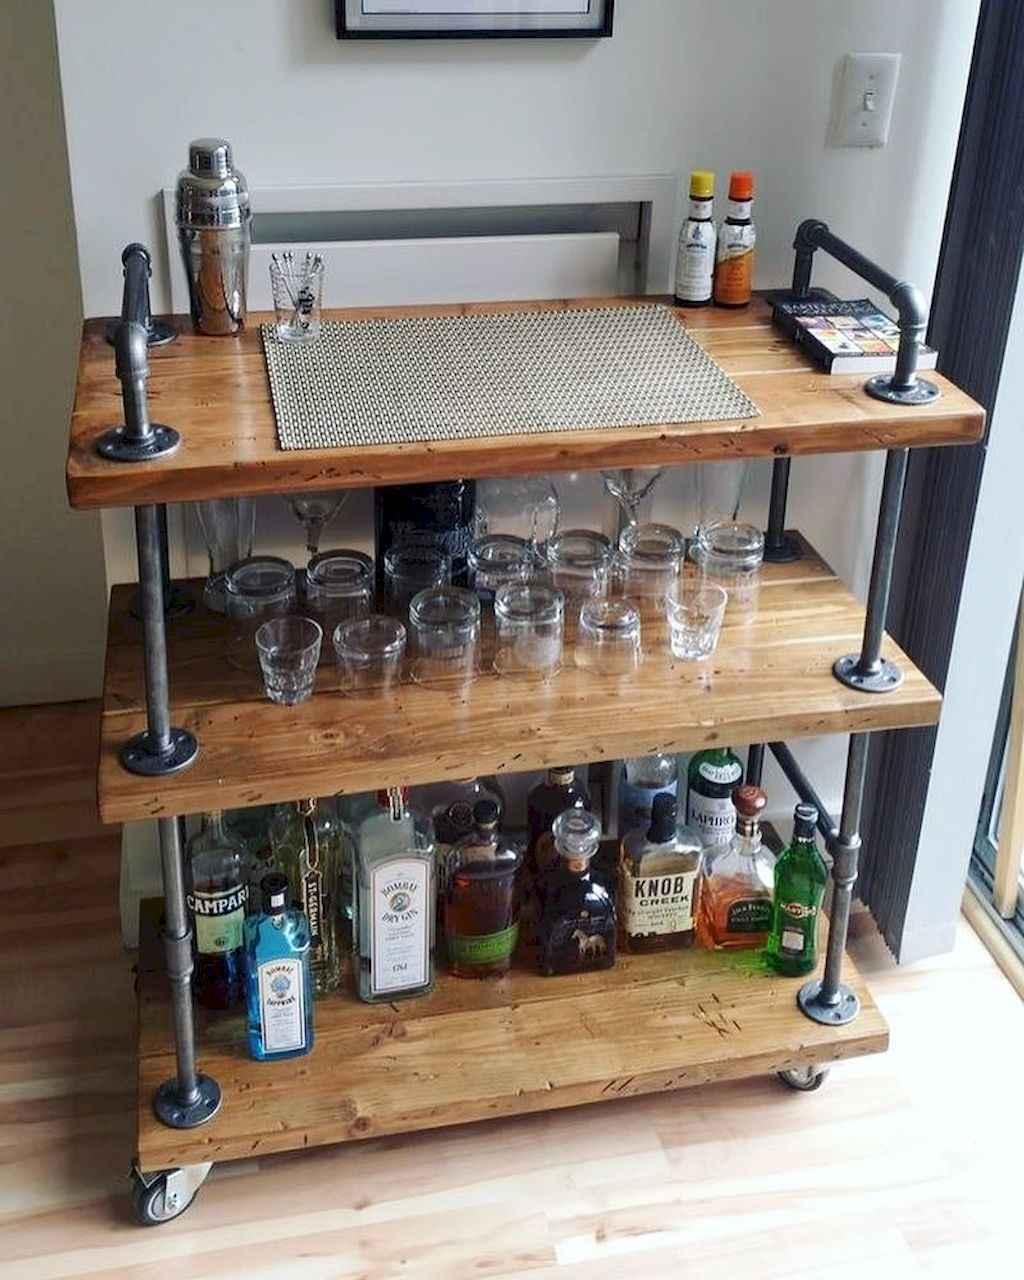 Diy Home Coffee Bar Ideas For Coffee Addict 19 Room A Holic